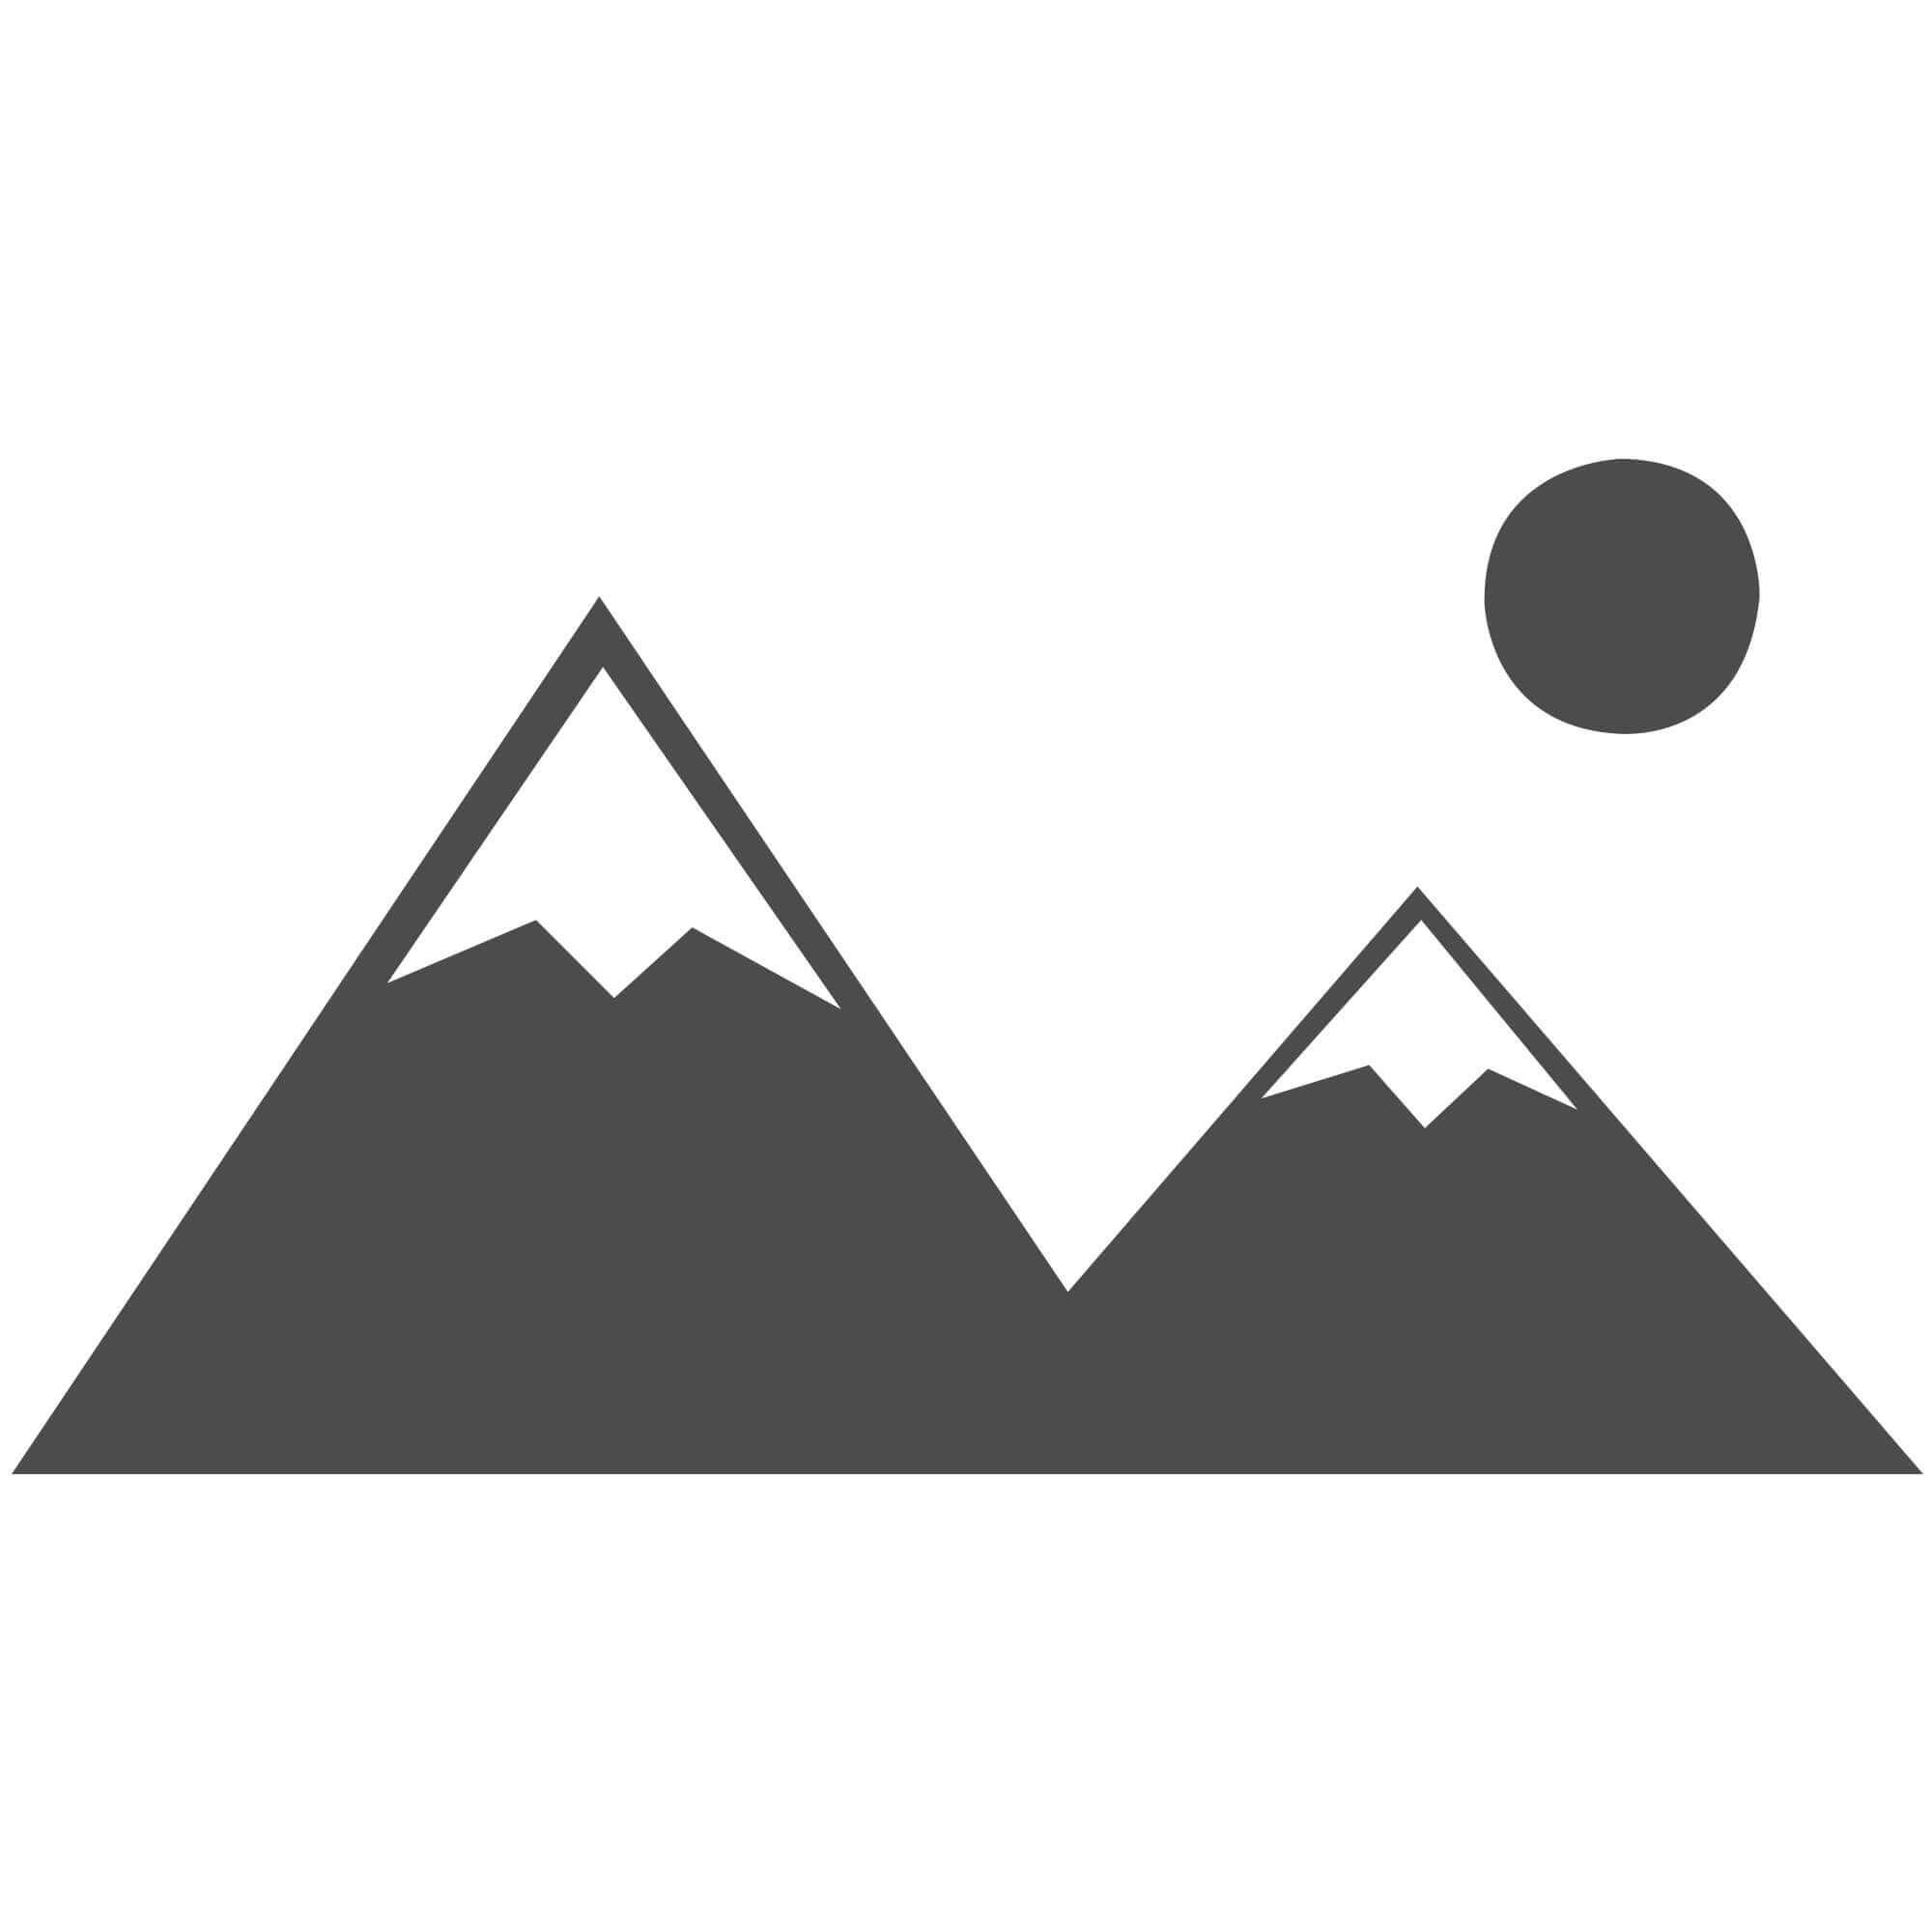 "Infinite Scope Teal Rug - Size 160 x 230 cm (5'3"" x 7'7"")"